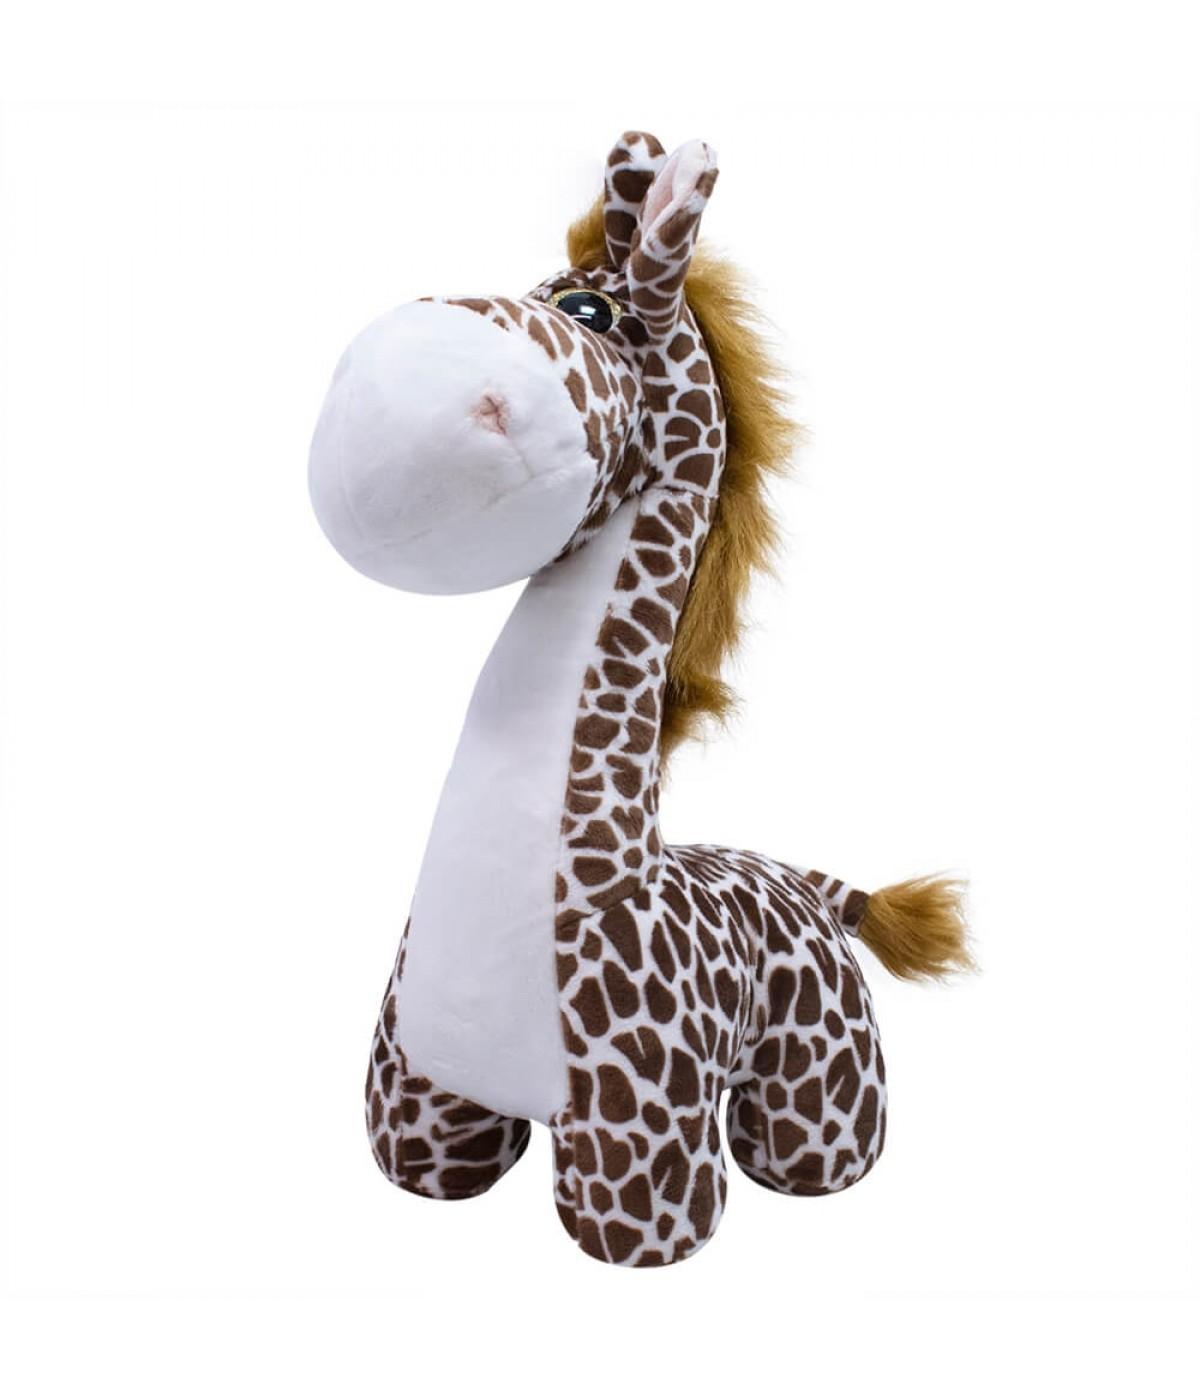 Girafa Focinho Comprido 27cm - Pelúcia